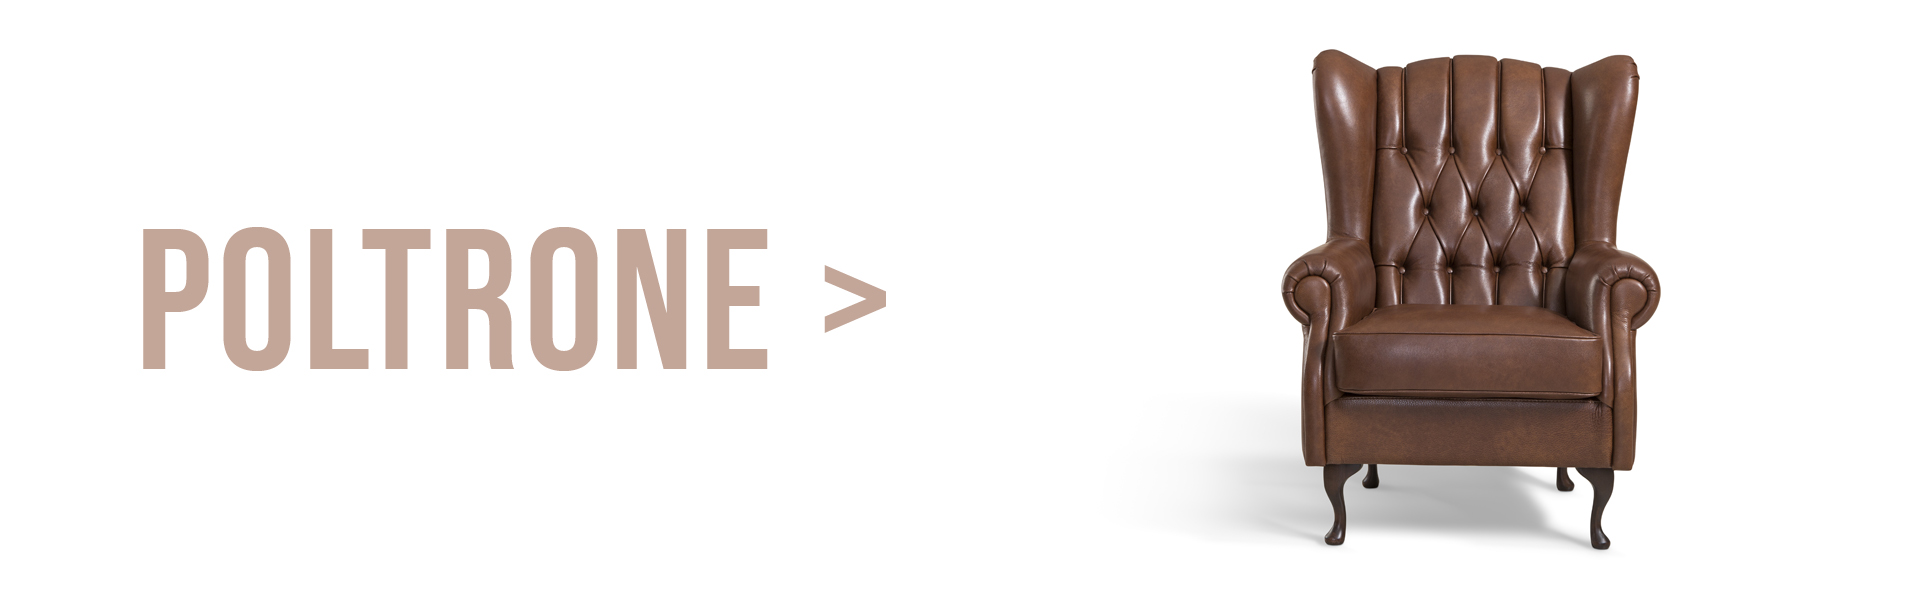 7_POLTRONE 2